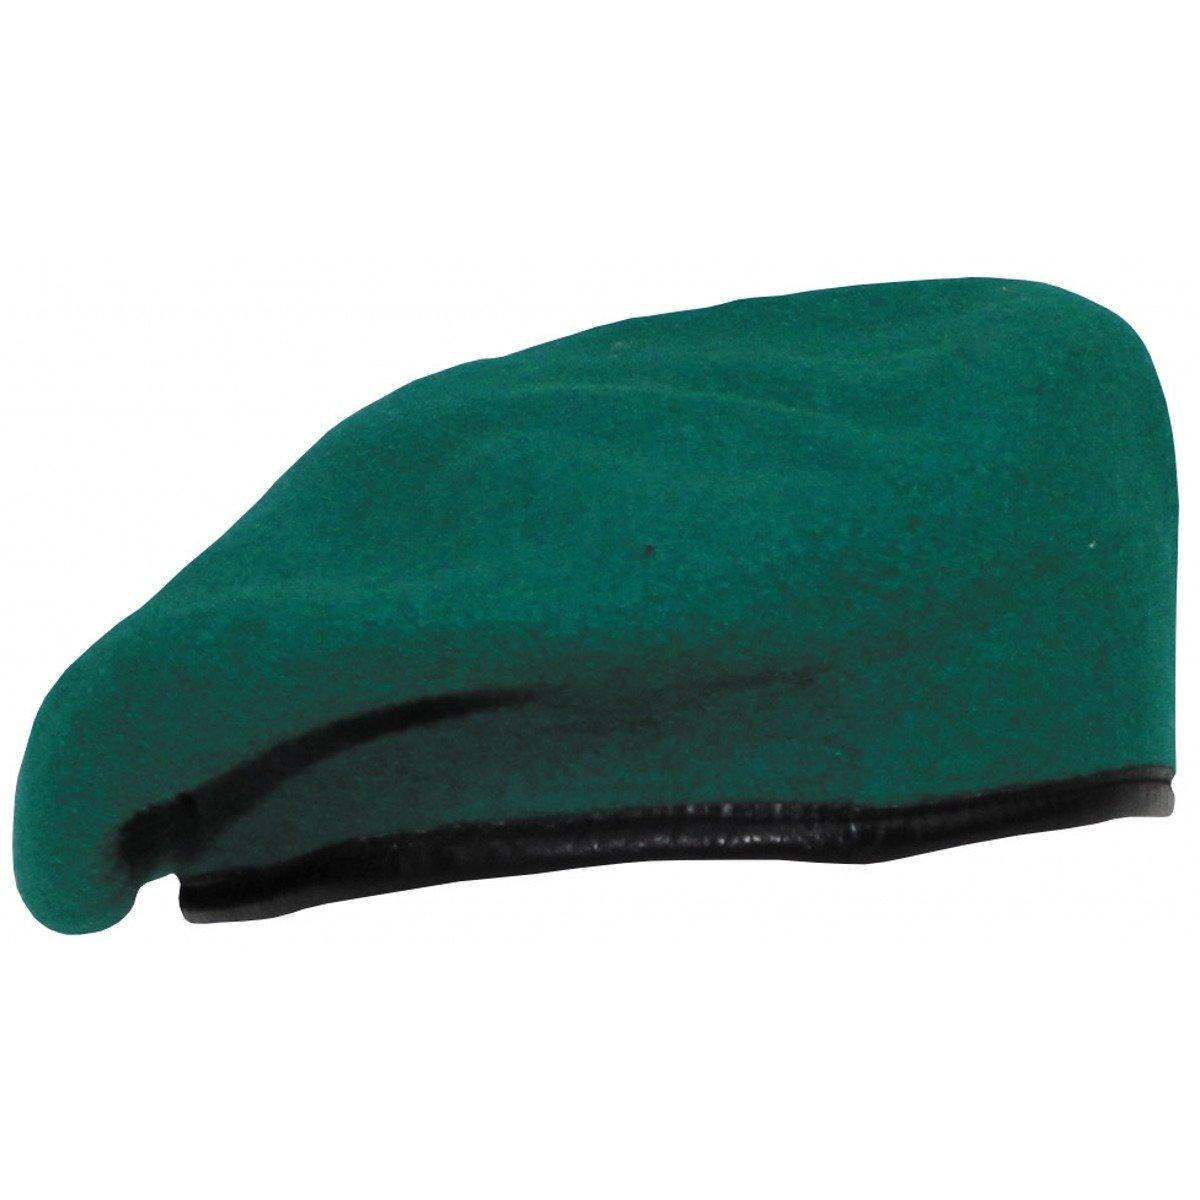 Svájci Sapka CZ - használt - zöld ... 53796351be